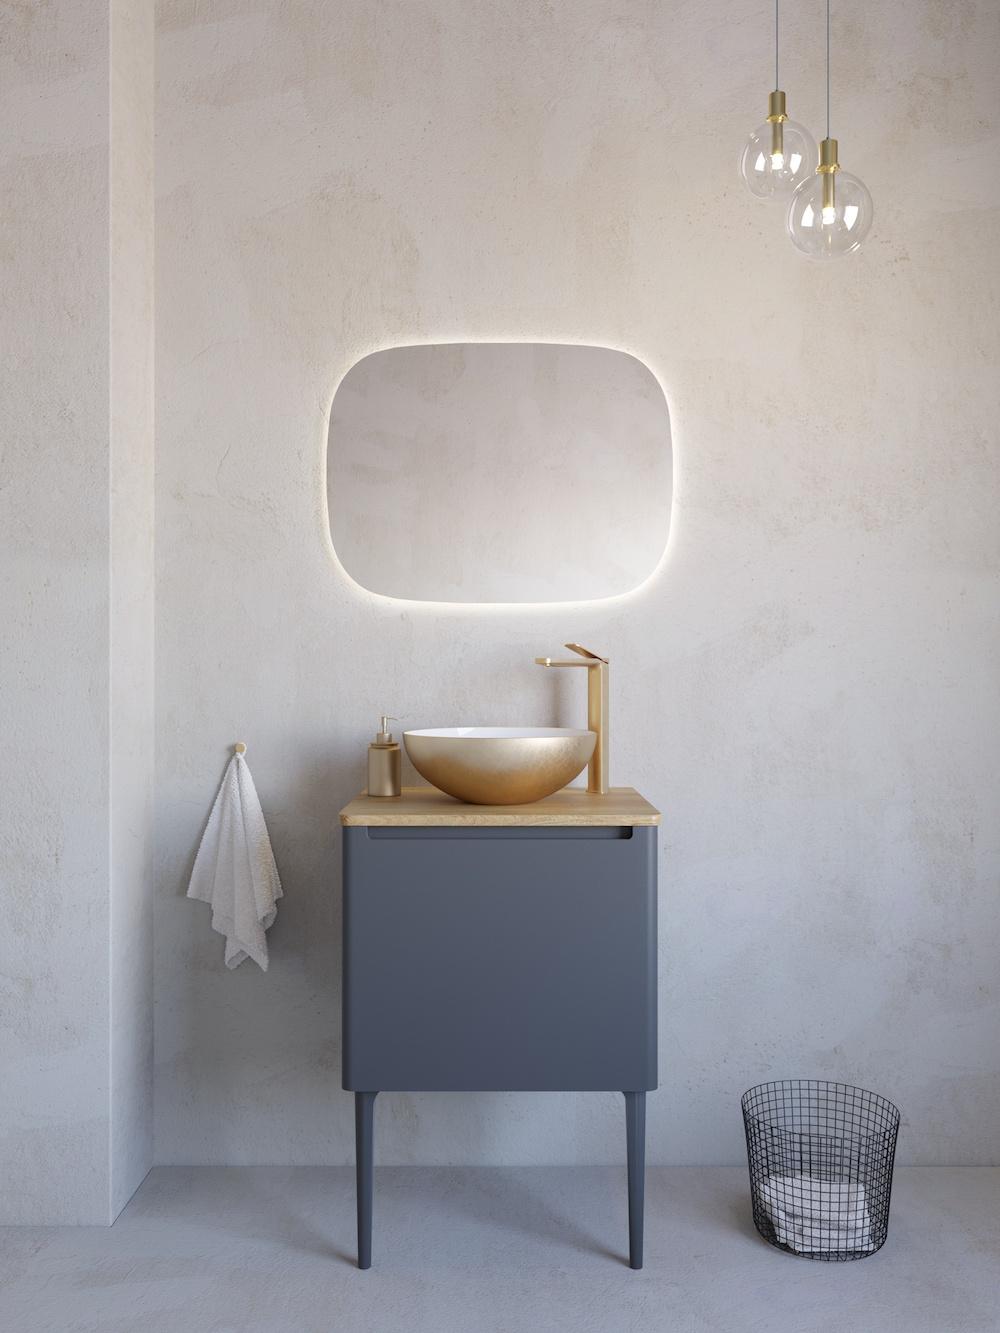 Modern bathroom with lighted mirror